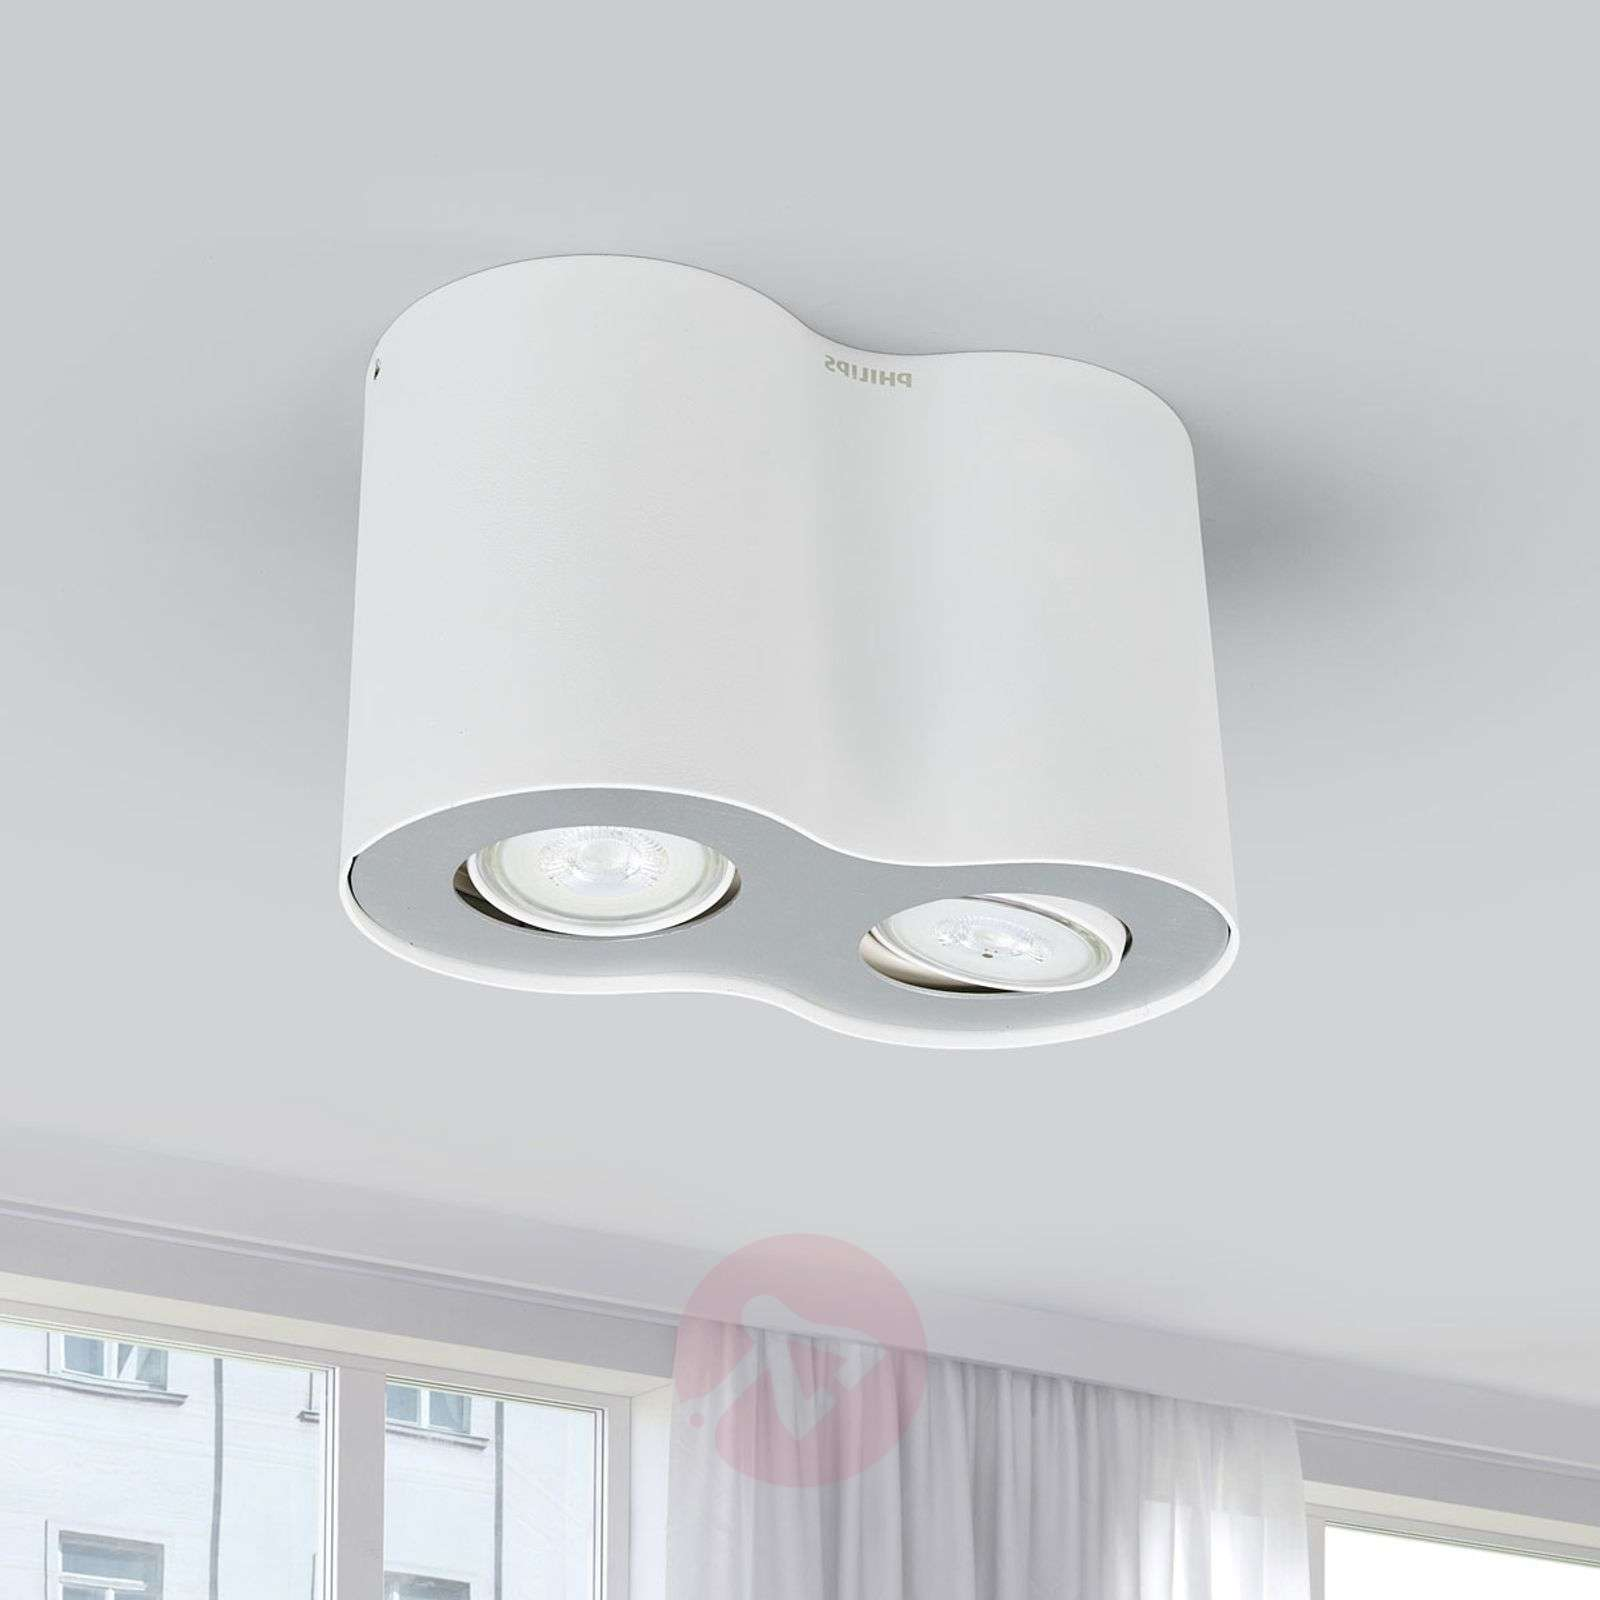 2 bulb led surface mounted ceiling light pillar lights 2 bulb led surface mounted ceiling light pillar 7531895 01 aloadofball Choice Image